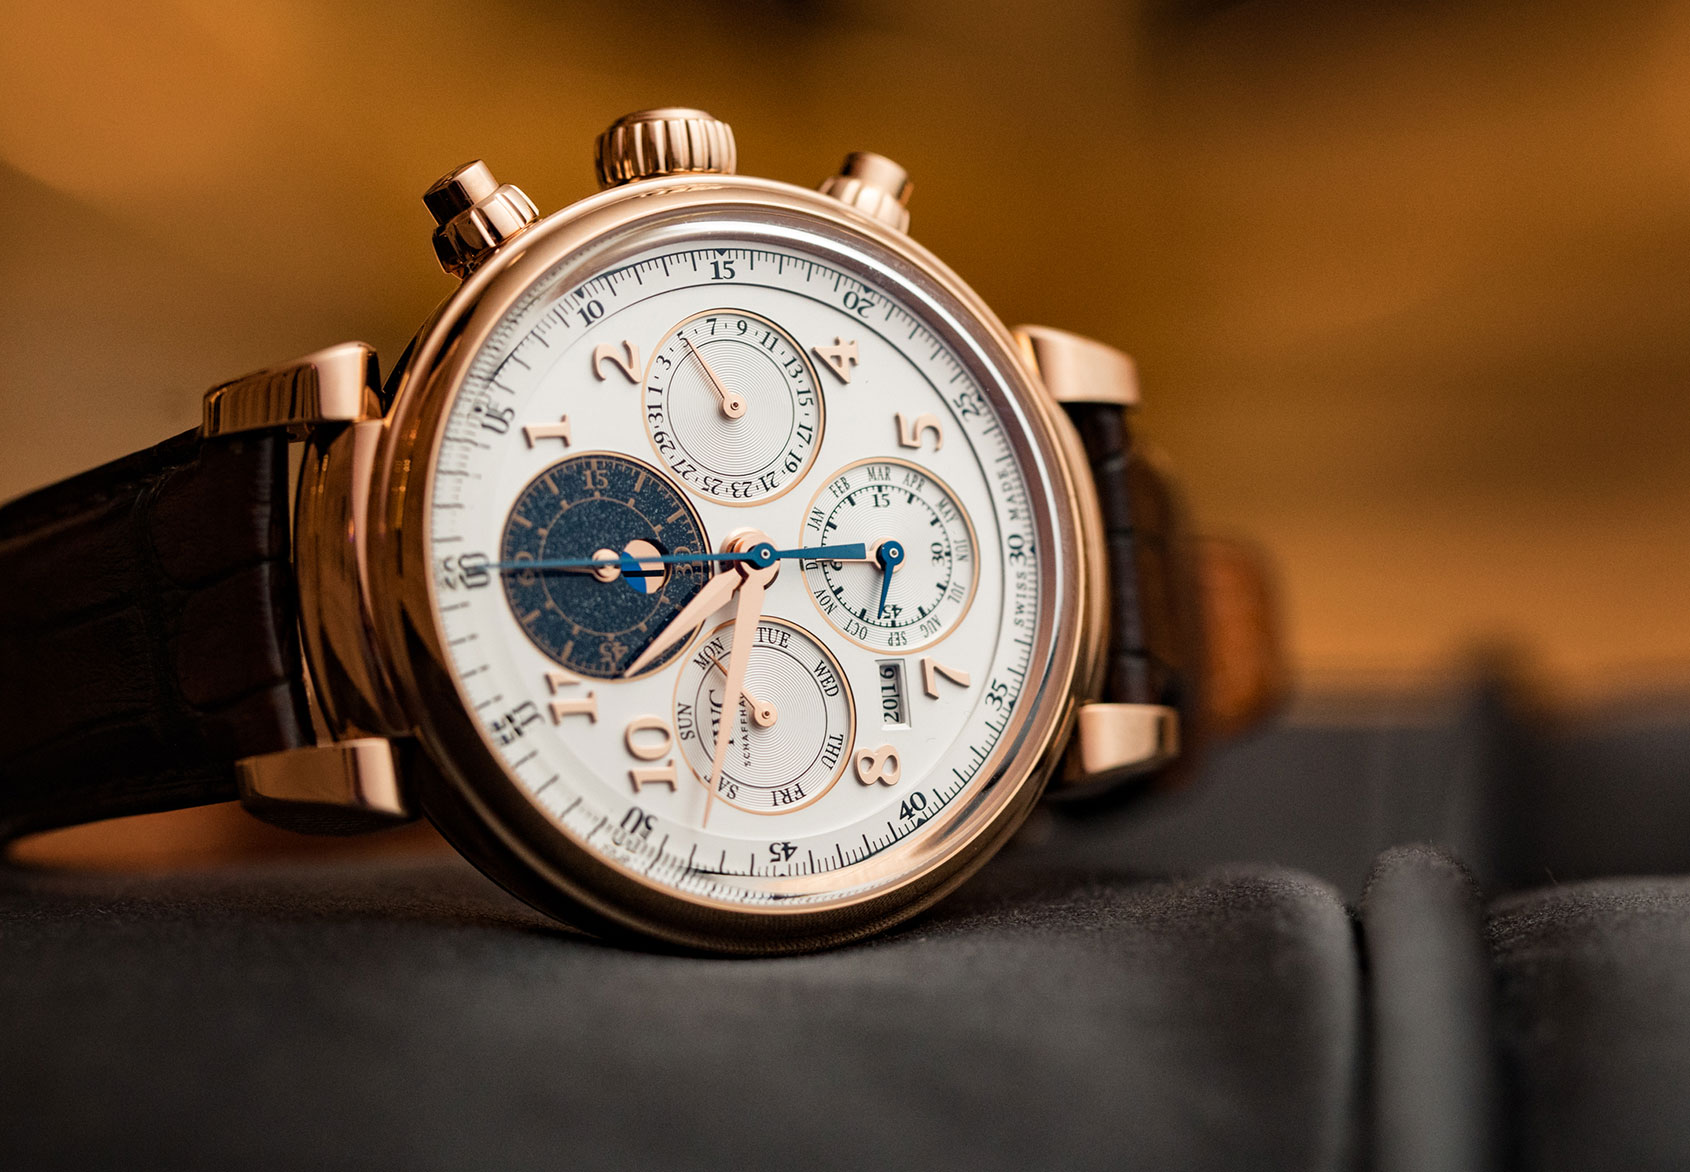 INTRODUCING: Return to form – the IWC Da Vinci Perpetual Calendar Chronograph